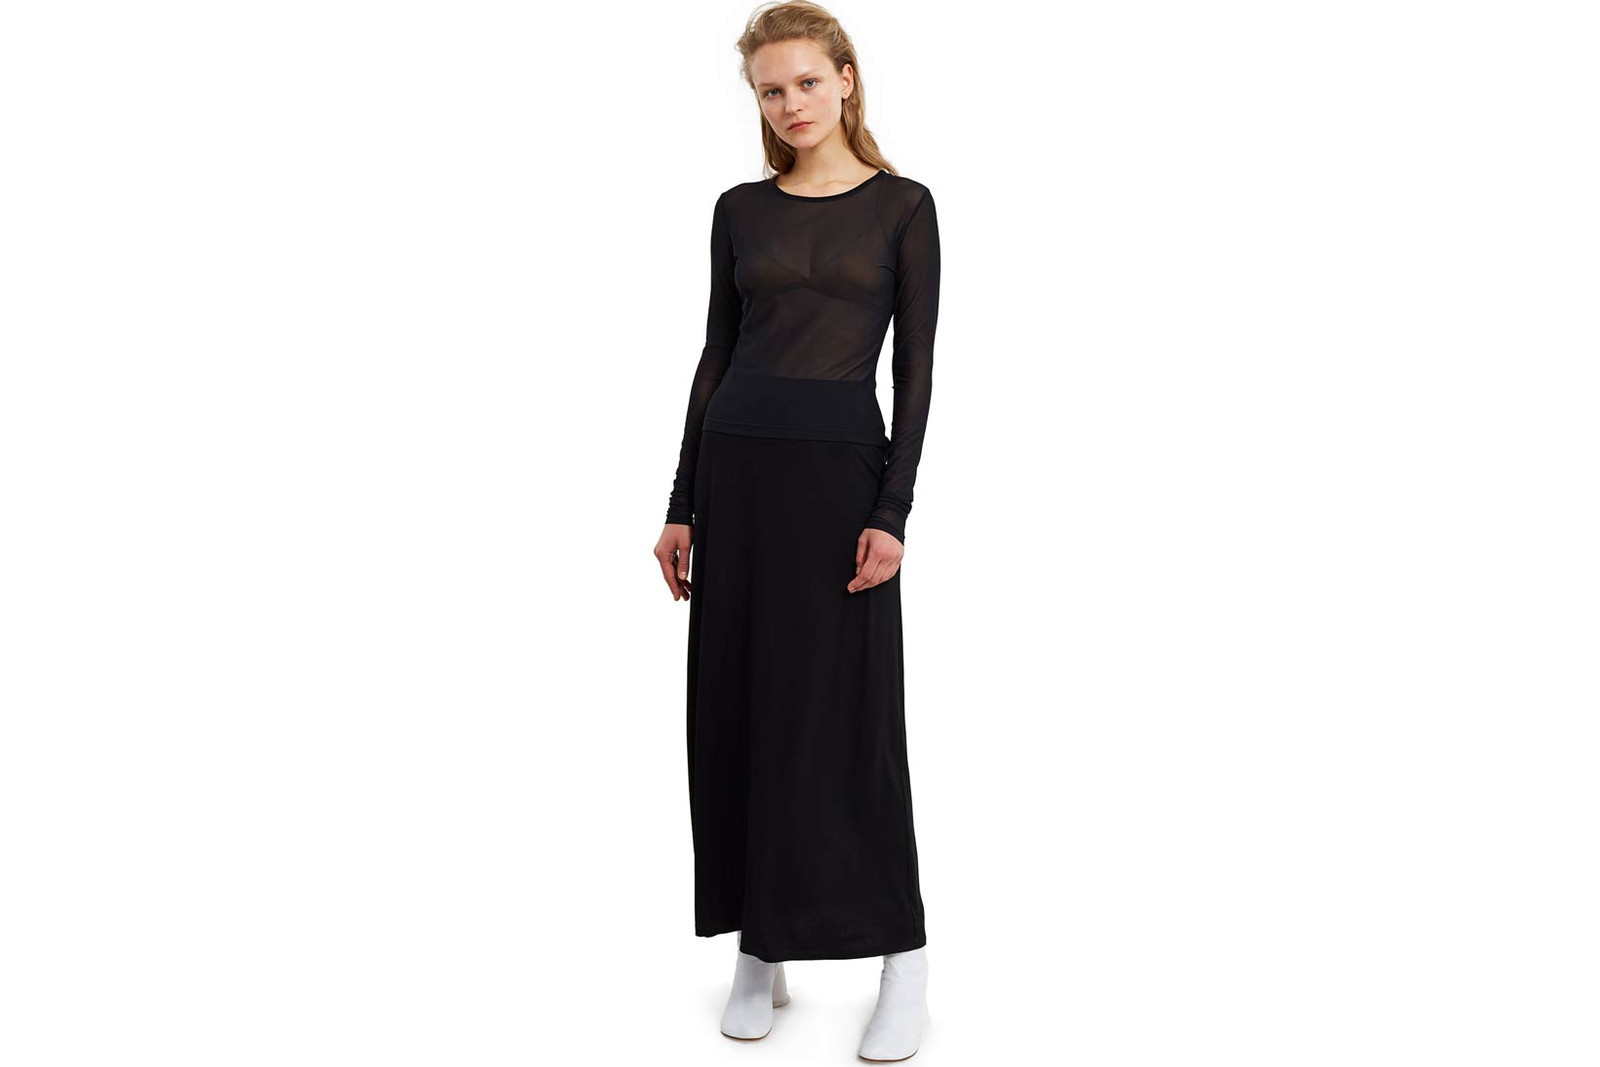 Balenciaga Tights Clutch Black